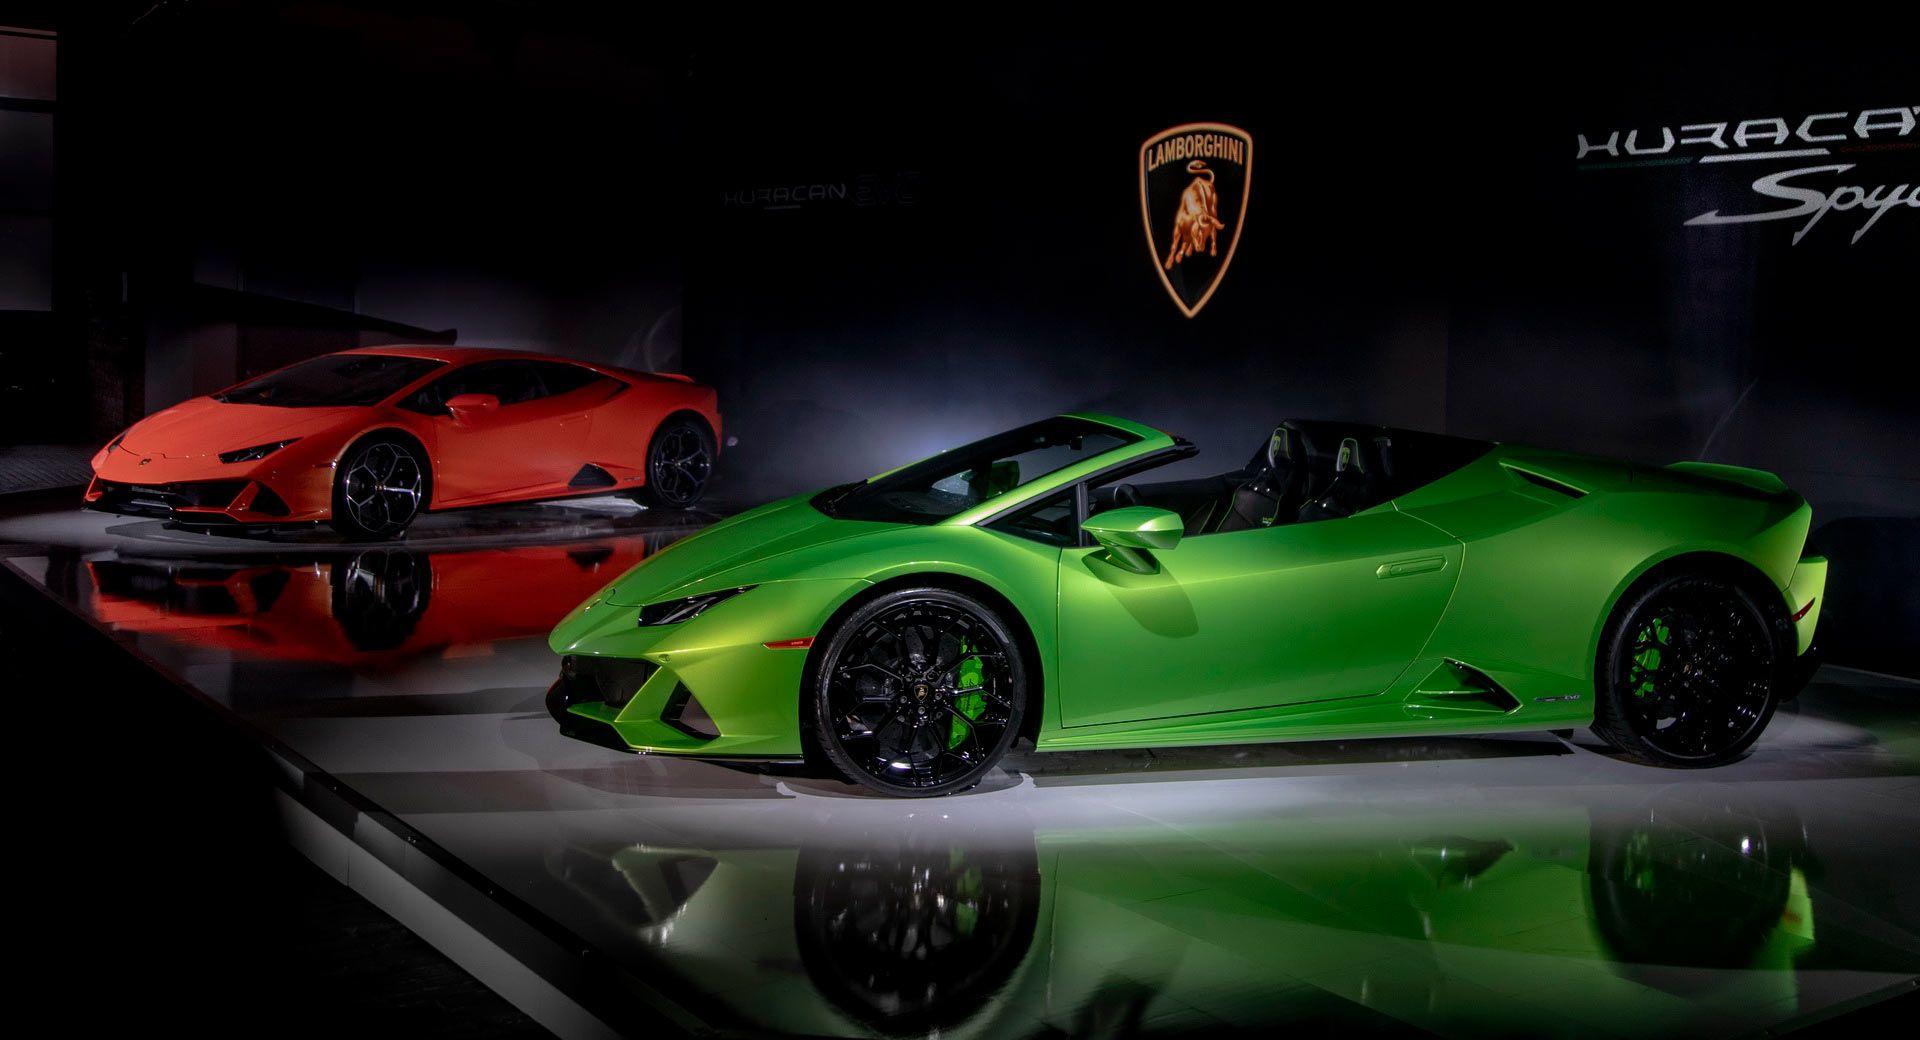 2020 Lamborghini Huracan Evo Arrives In Usa Priced From